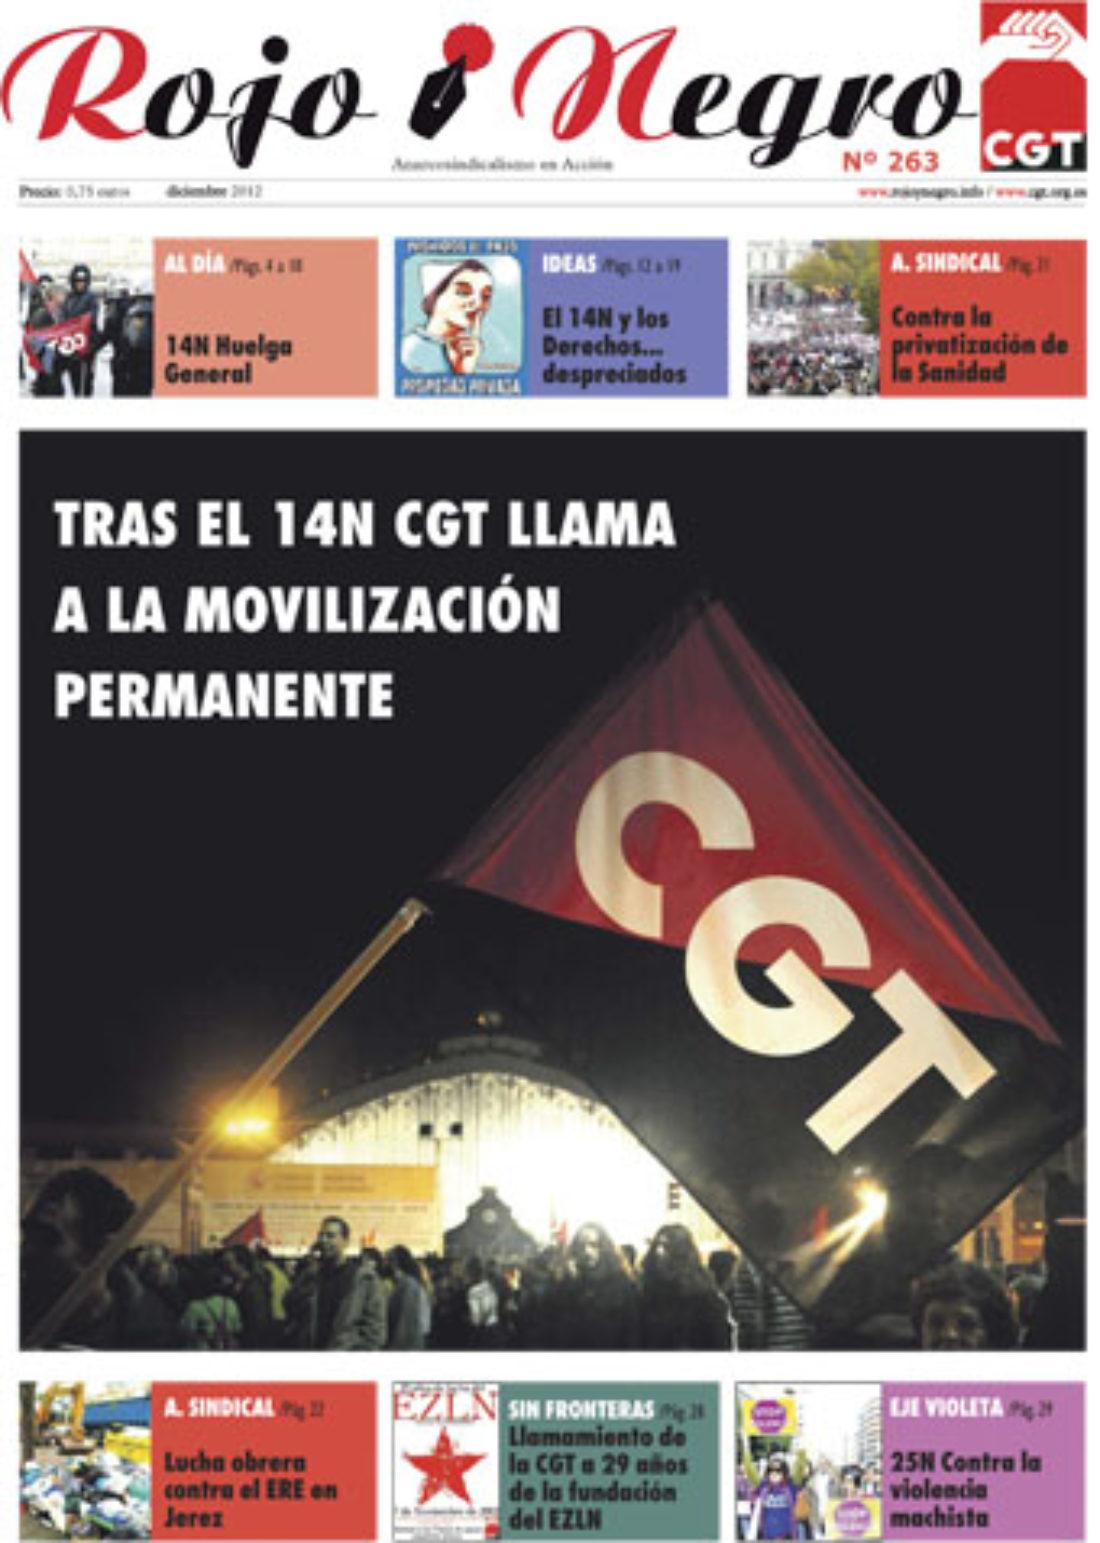 Rojo y Negro nº 263 Diciembre 2012